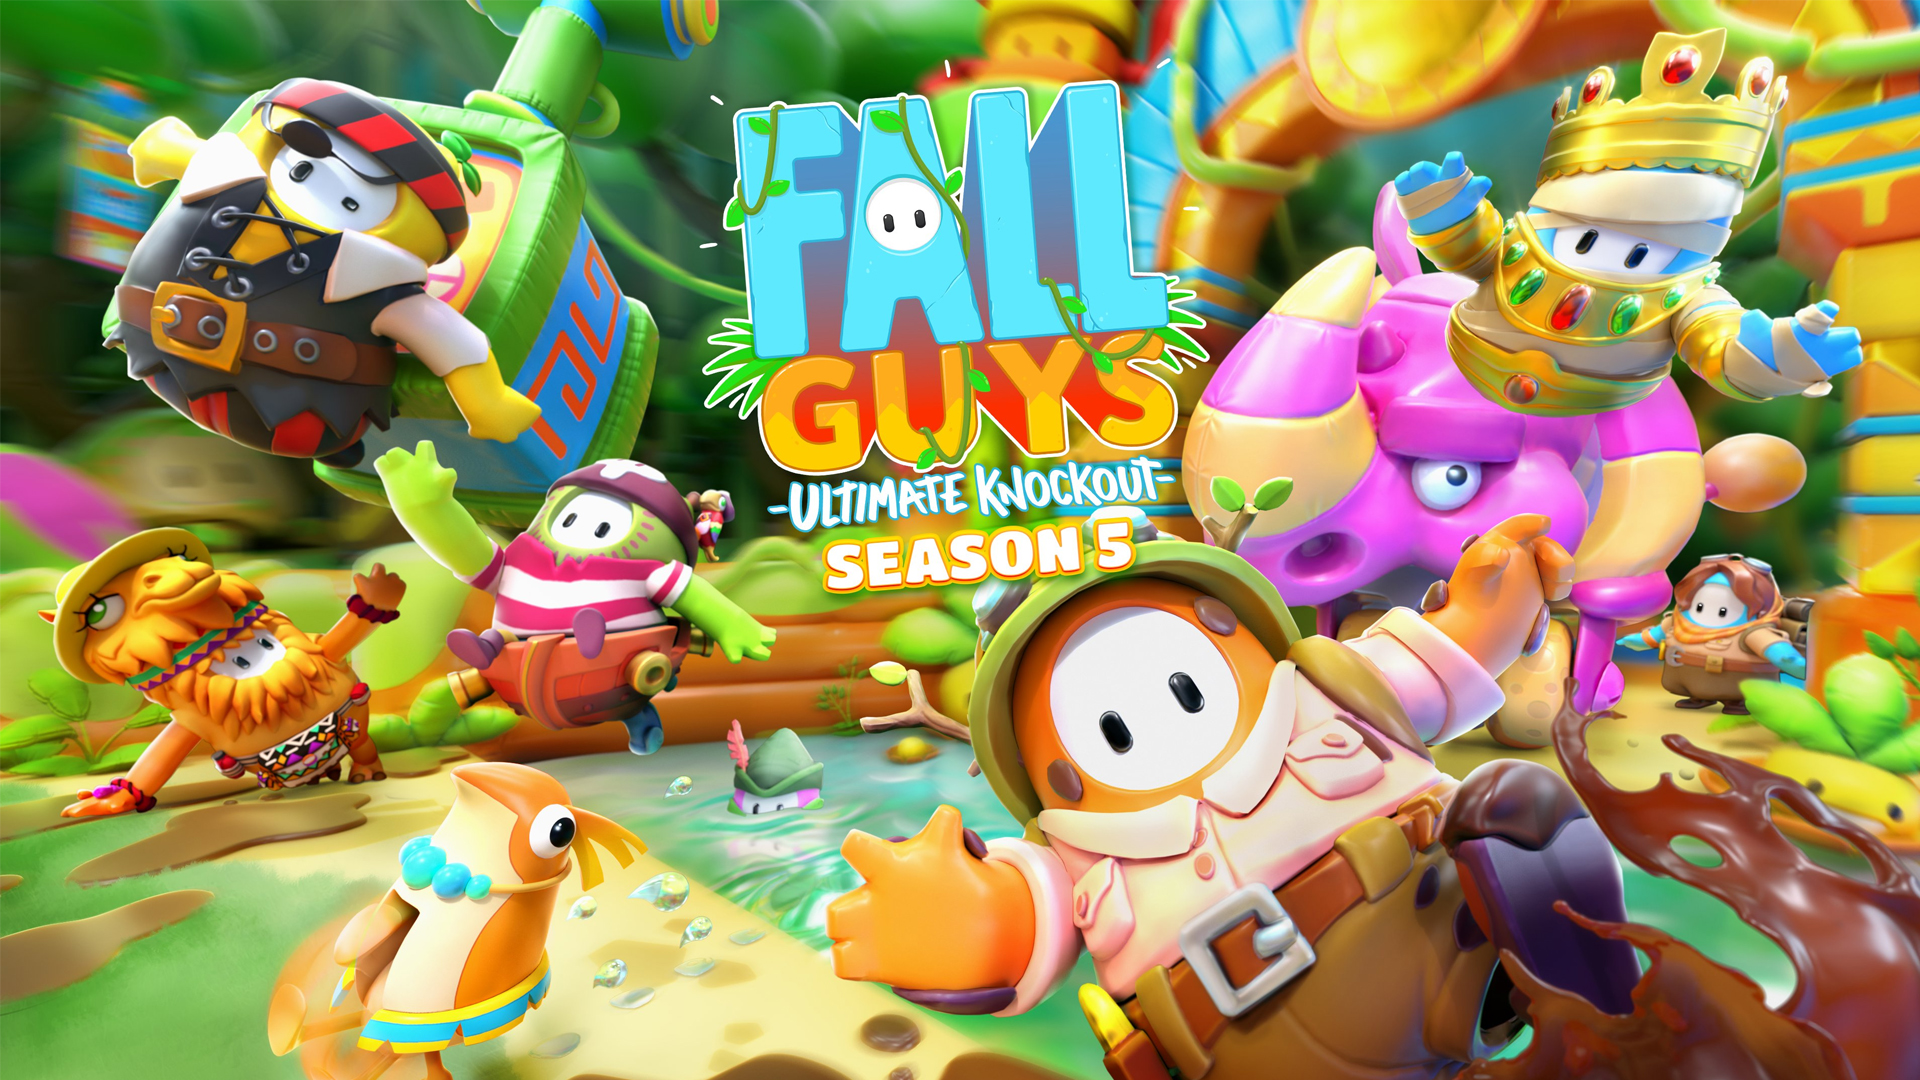 Fall Guys: Ultimate Knockout Season 5